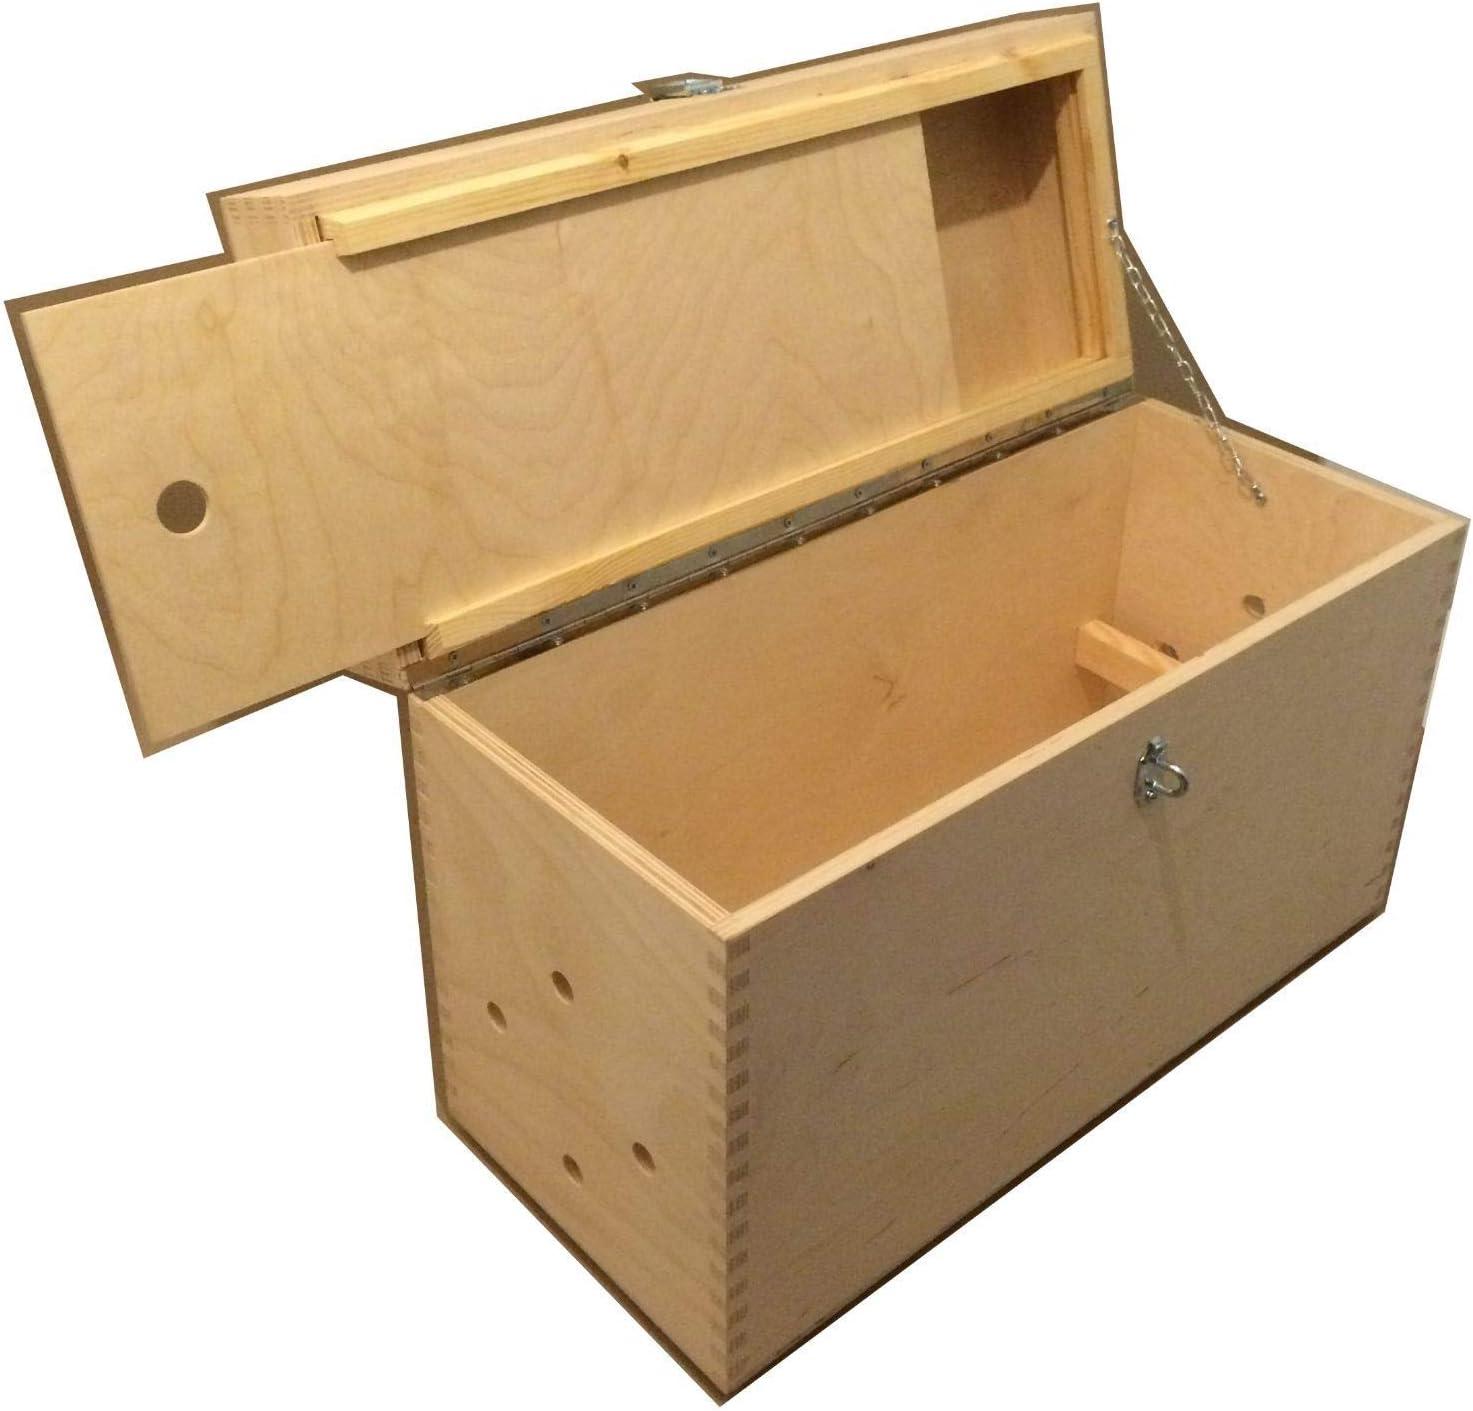 PROFI Maler Werkzeugkoffer Tapezierkoffer Holzkoffer Holz Koffer 65x40x18 cm